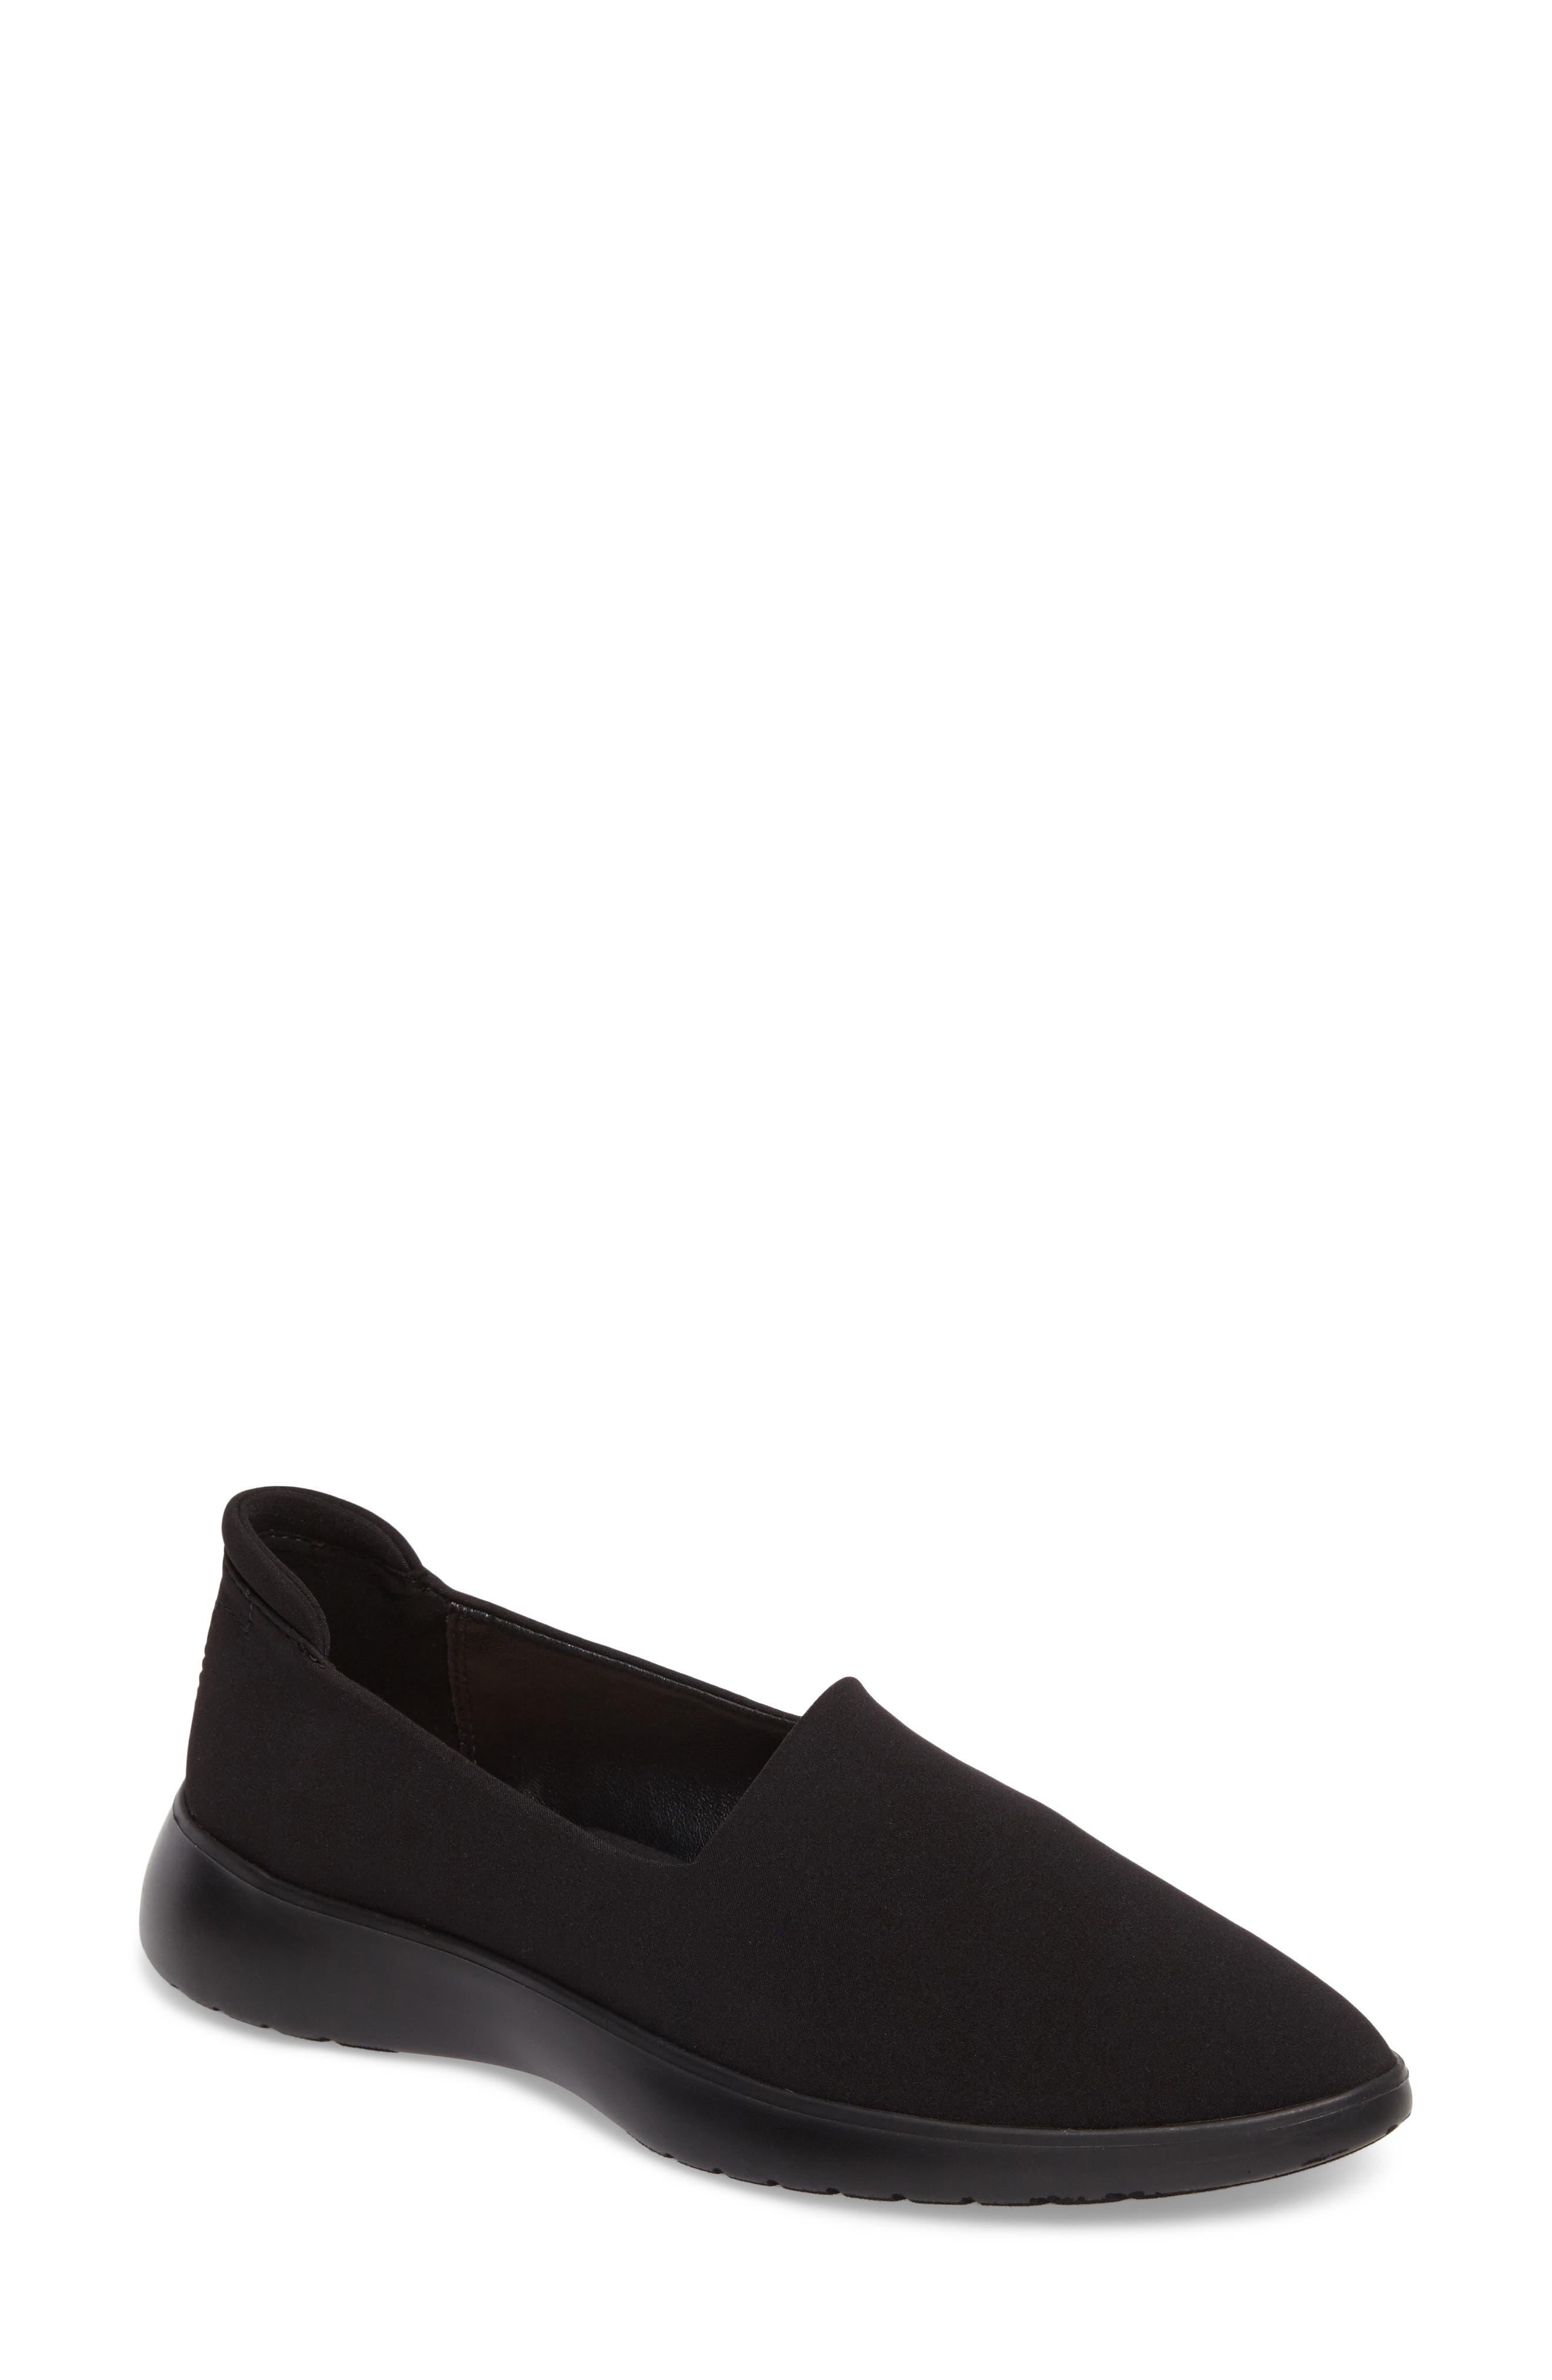 Darla Flat,                         Main,                         color, Black Fabric